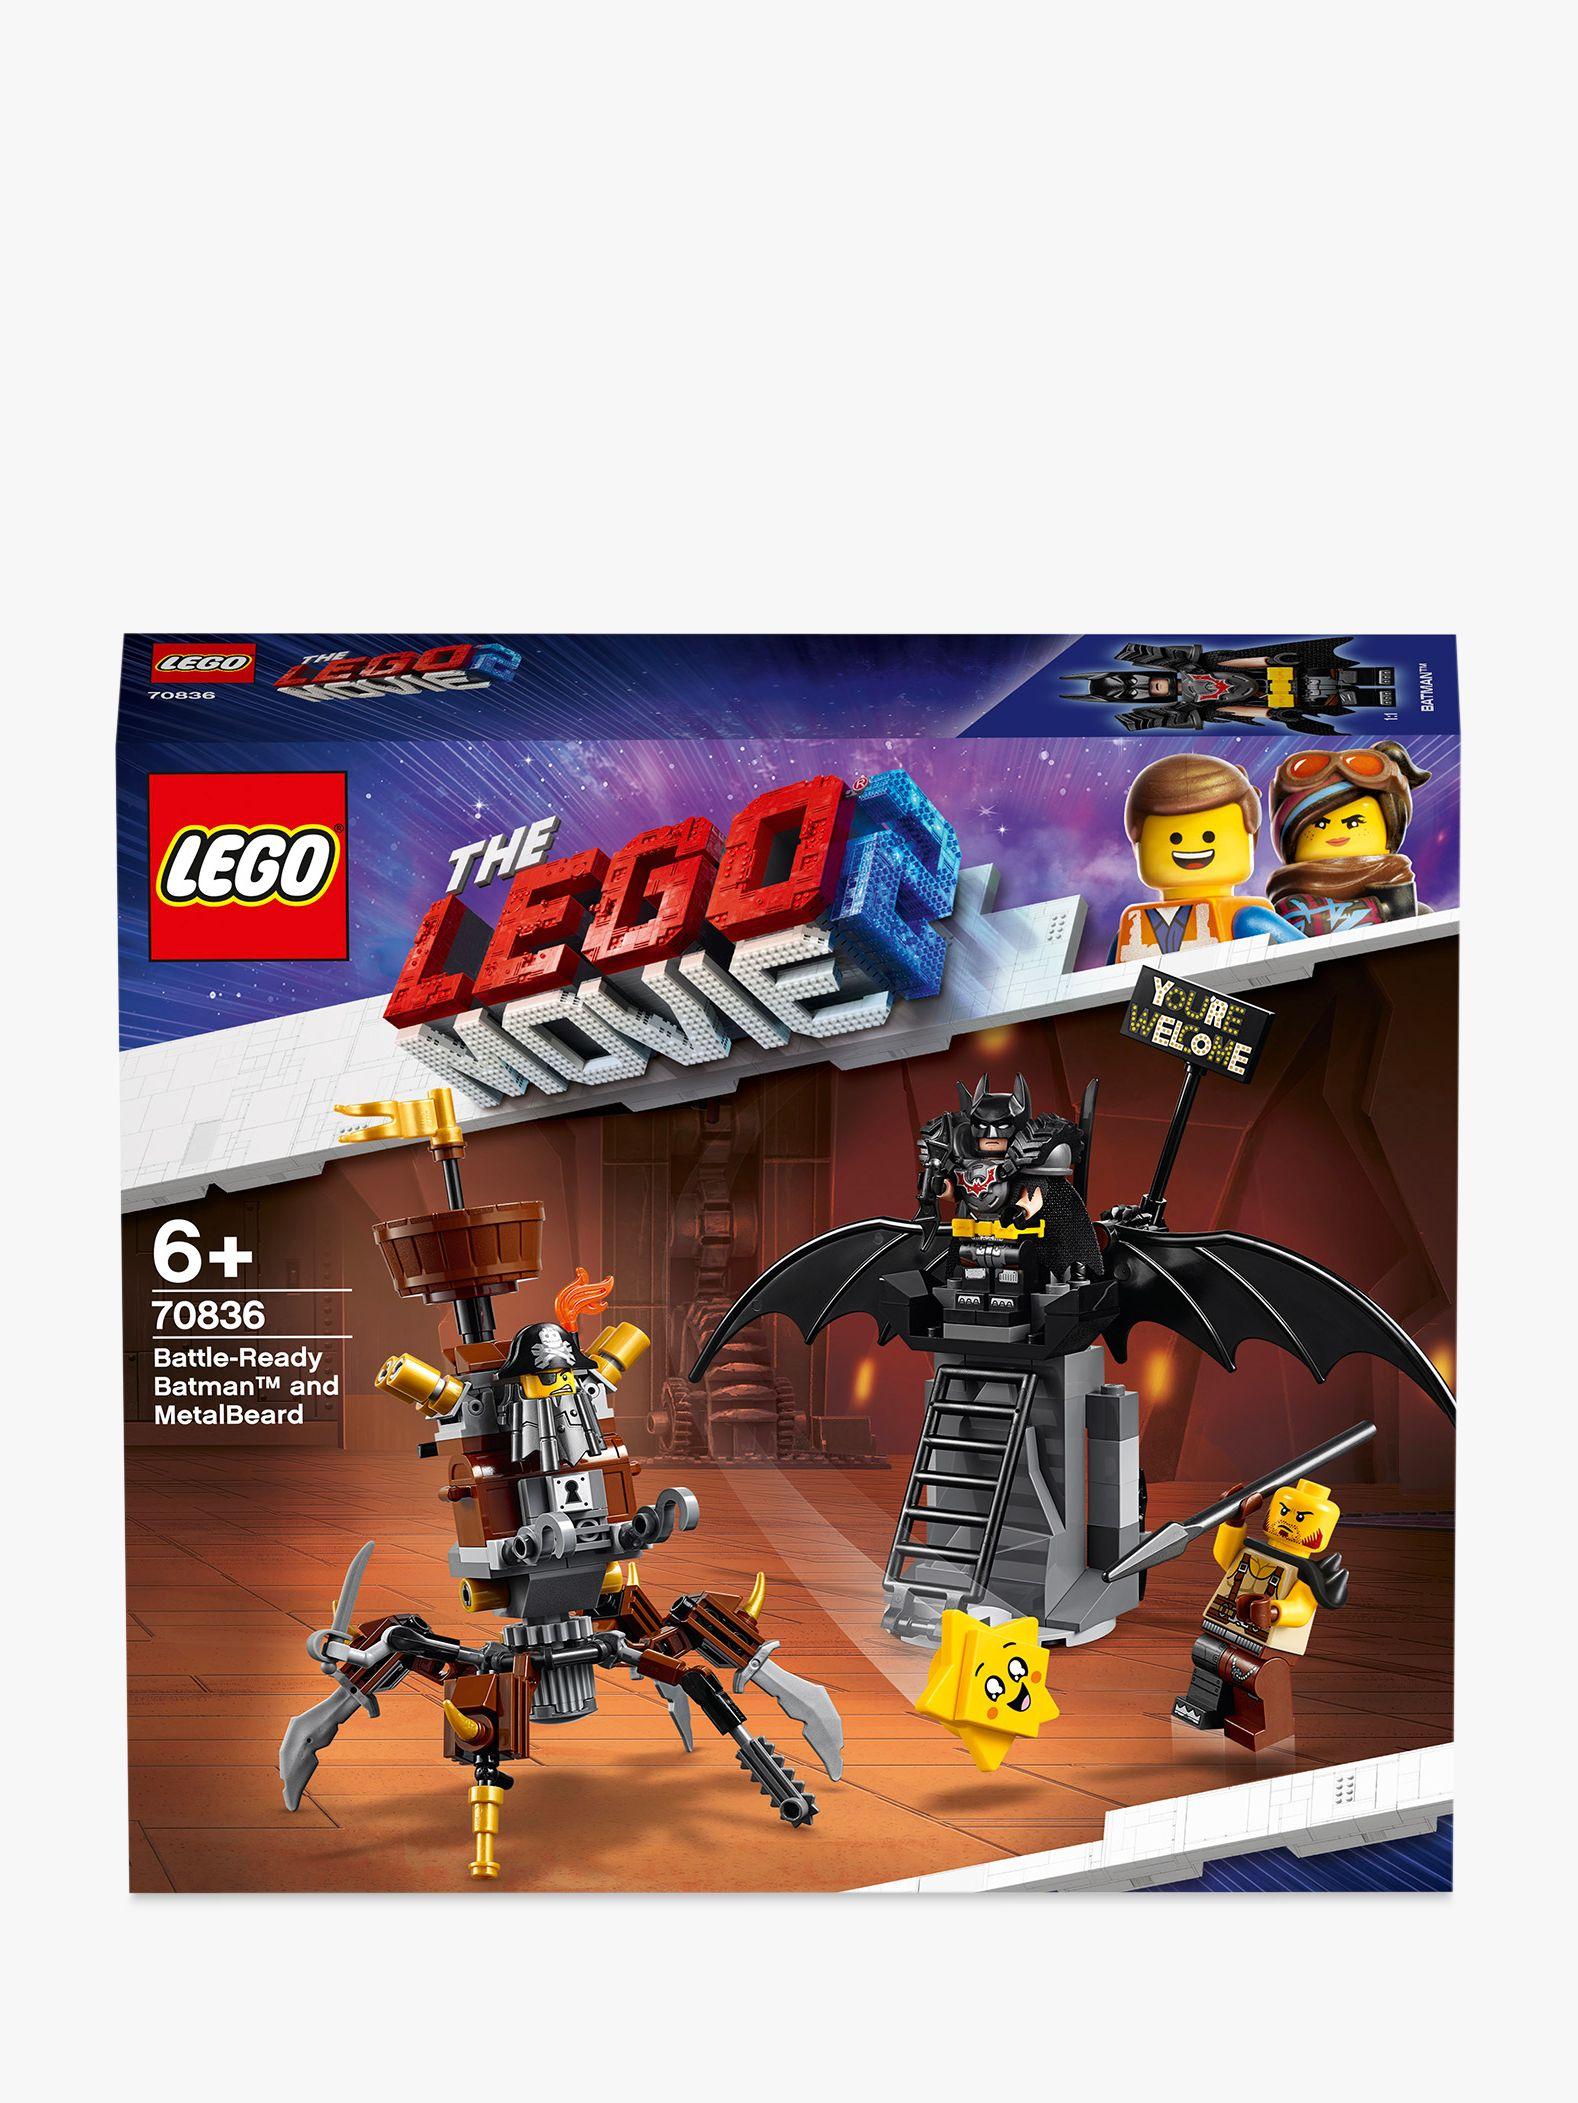 LEGO THE LEGO MOVIE 2 Playtime 70836 Battle-Ready Batman and MetalBeard